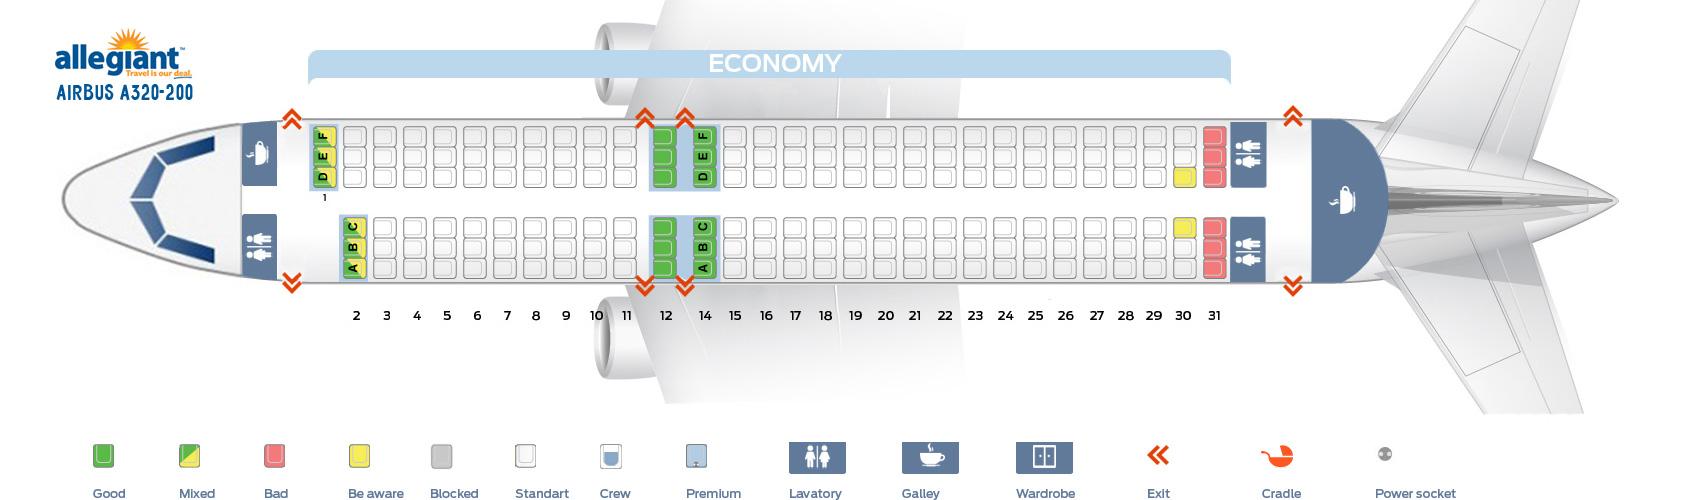 Mapa de asientos Airbus A320 Allegiant Air